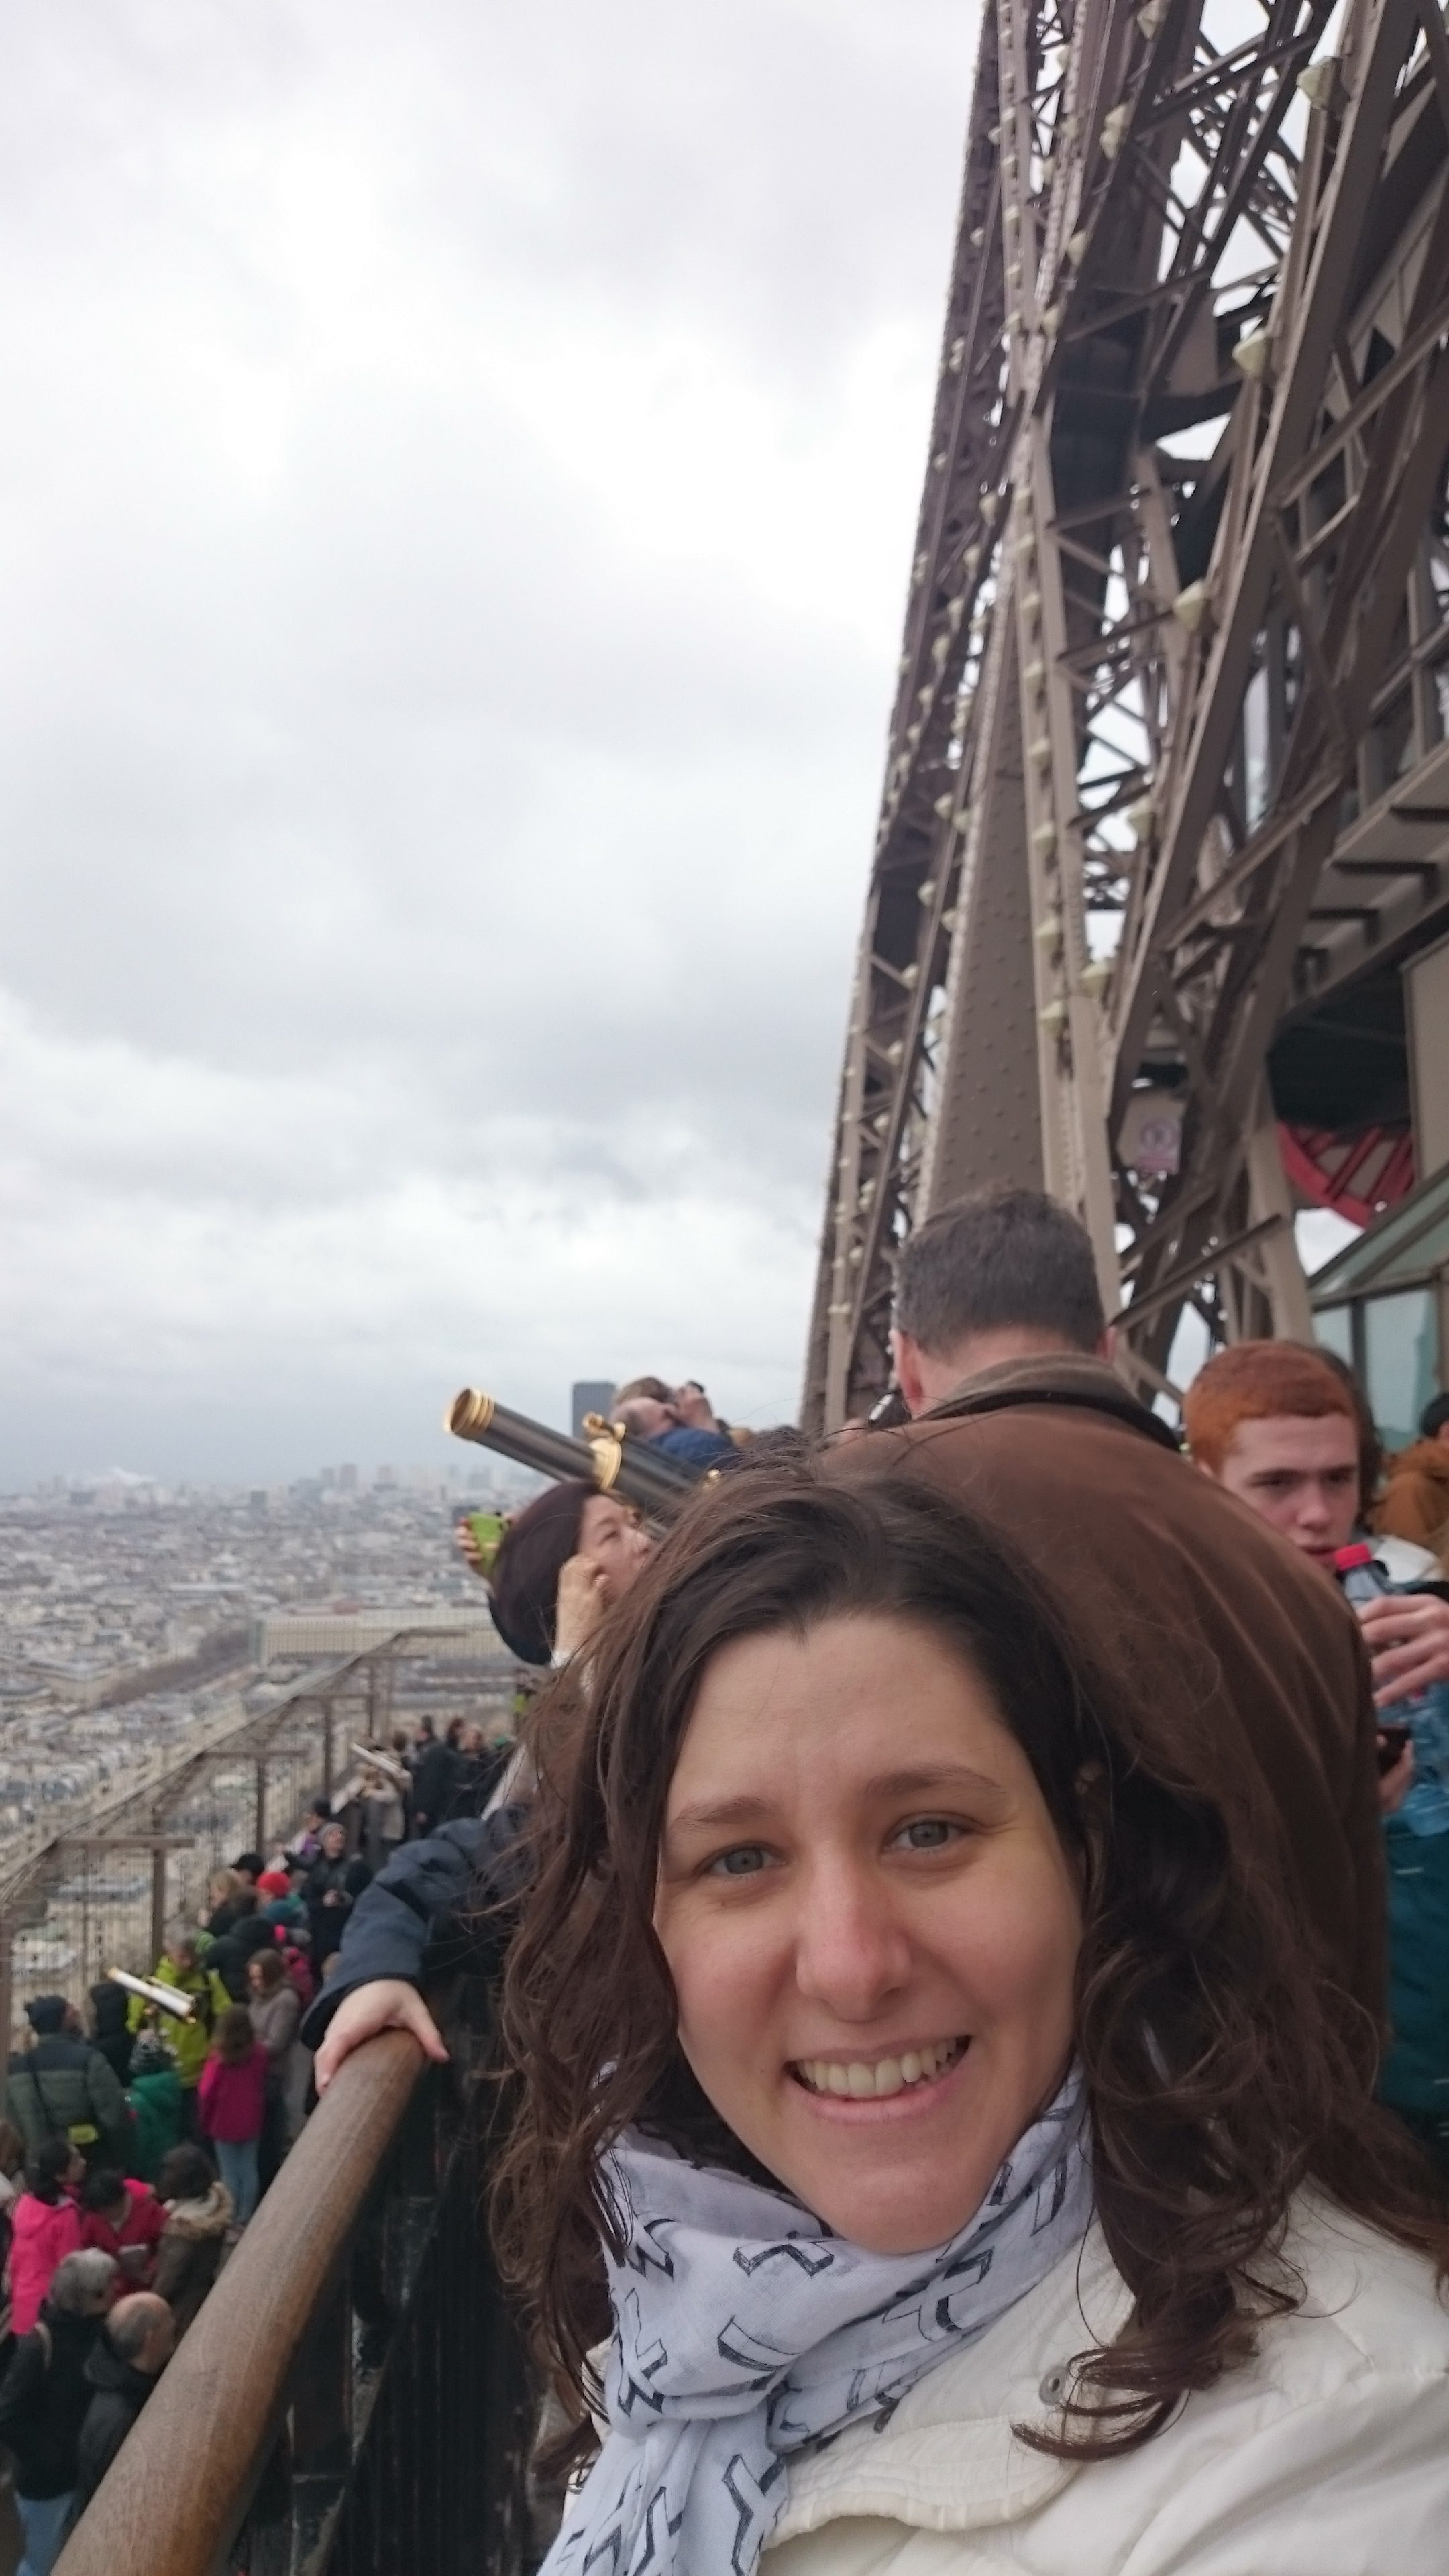 DSC 1942 e1512001354686 - Visitando la Torre Eiffel en Paris